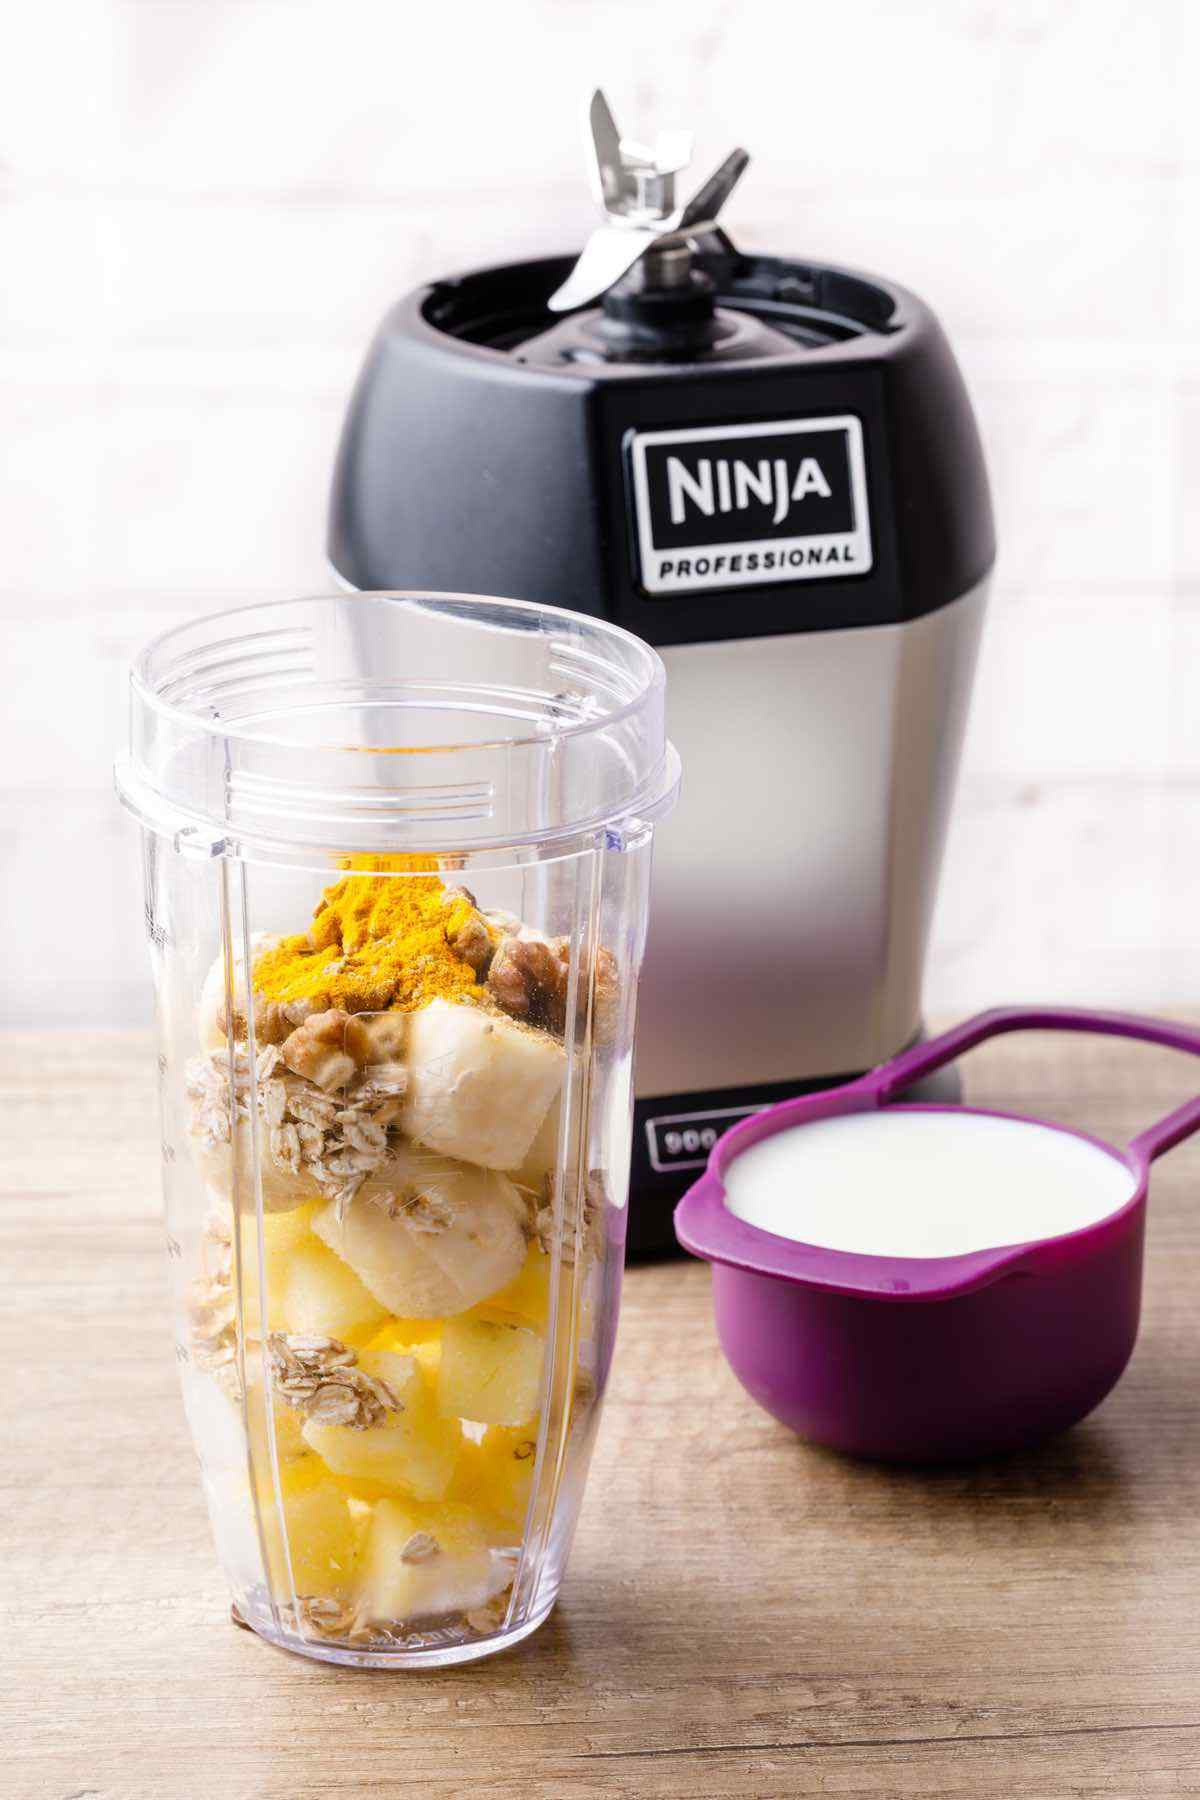 Banana Pineapple Breakfast Smoothie